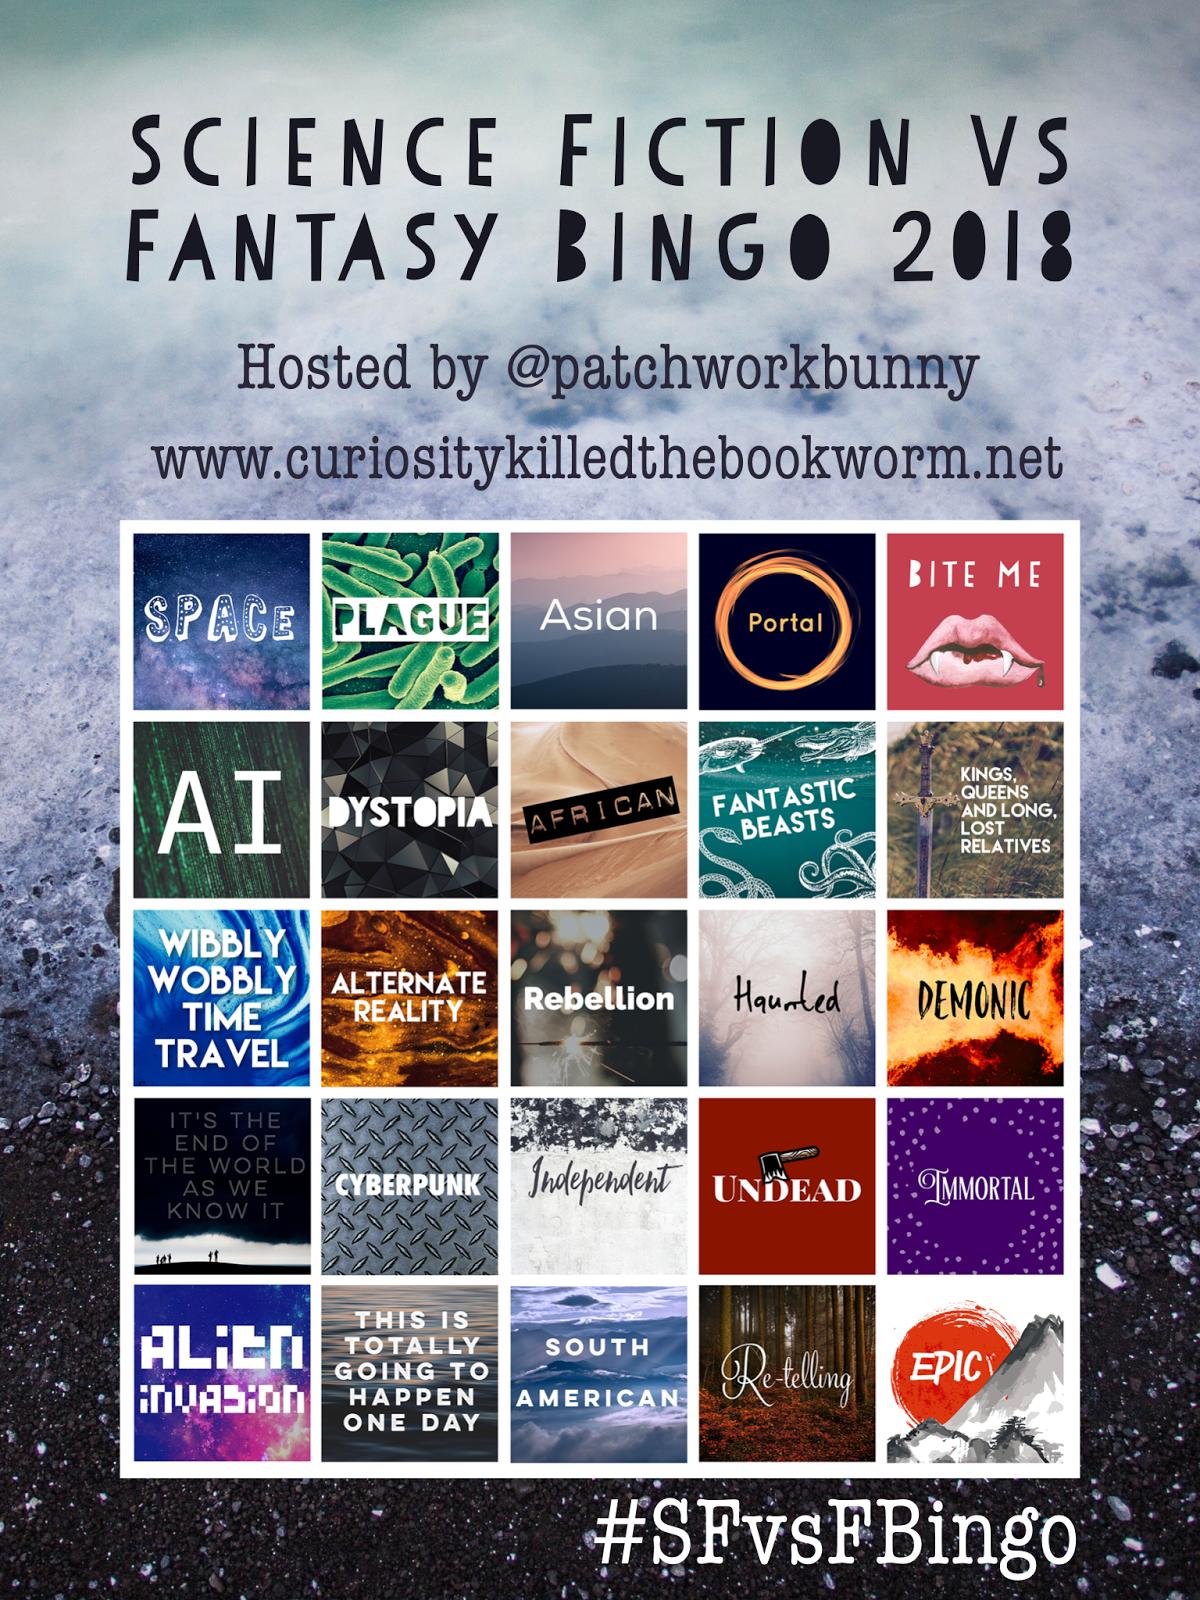 Science Fiction vs Fantasy Bingo 2018